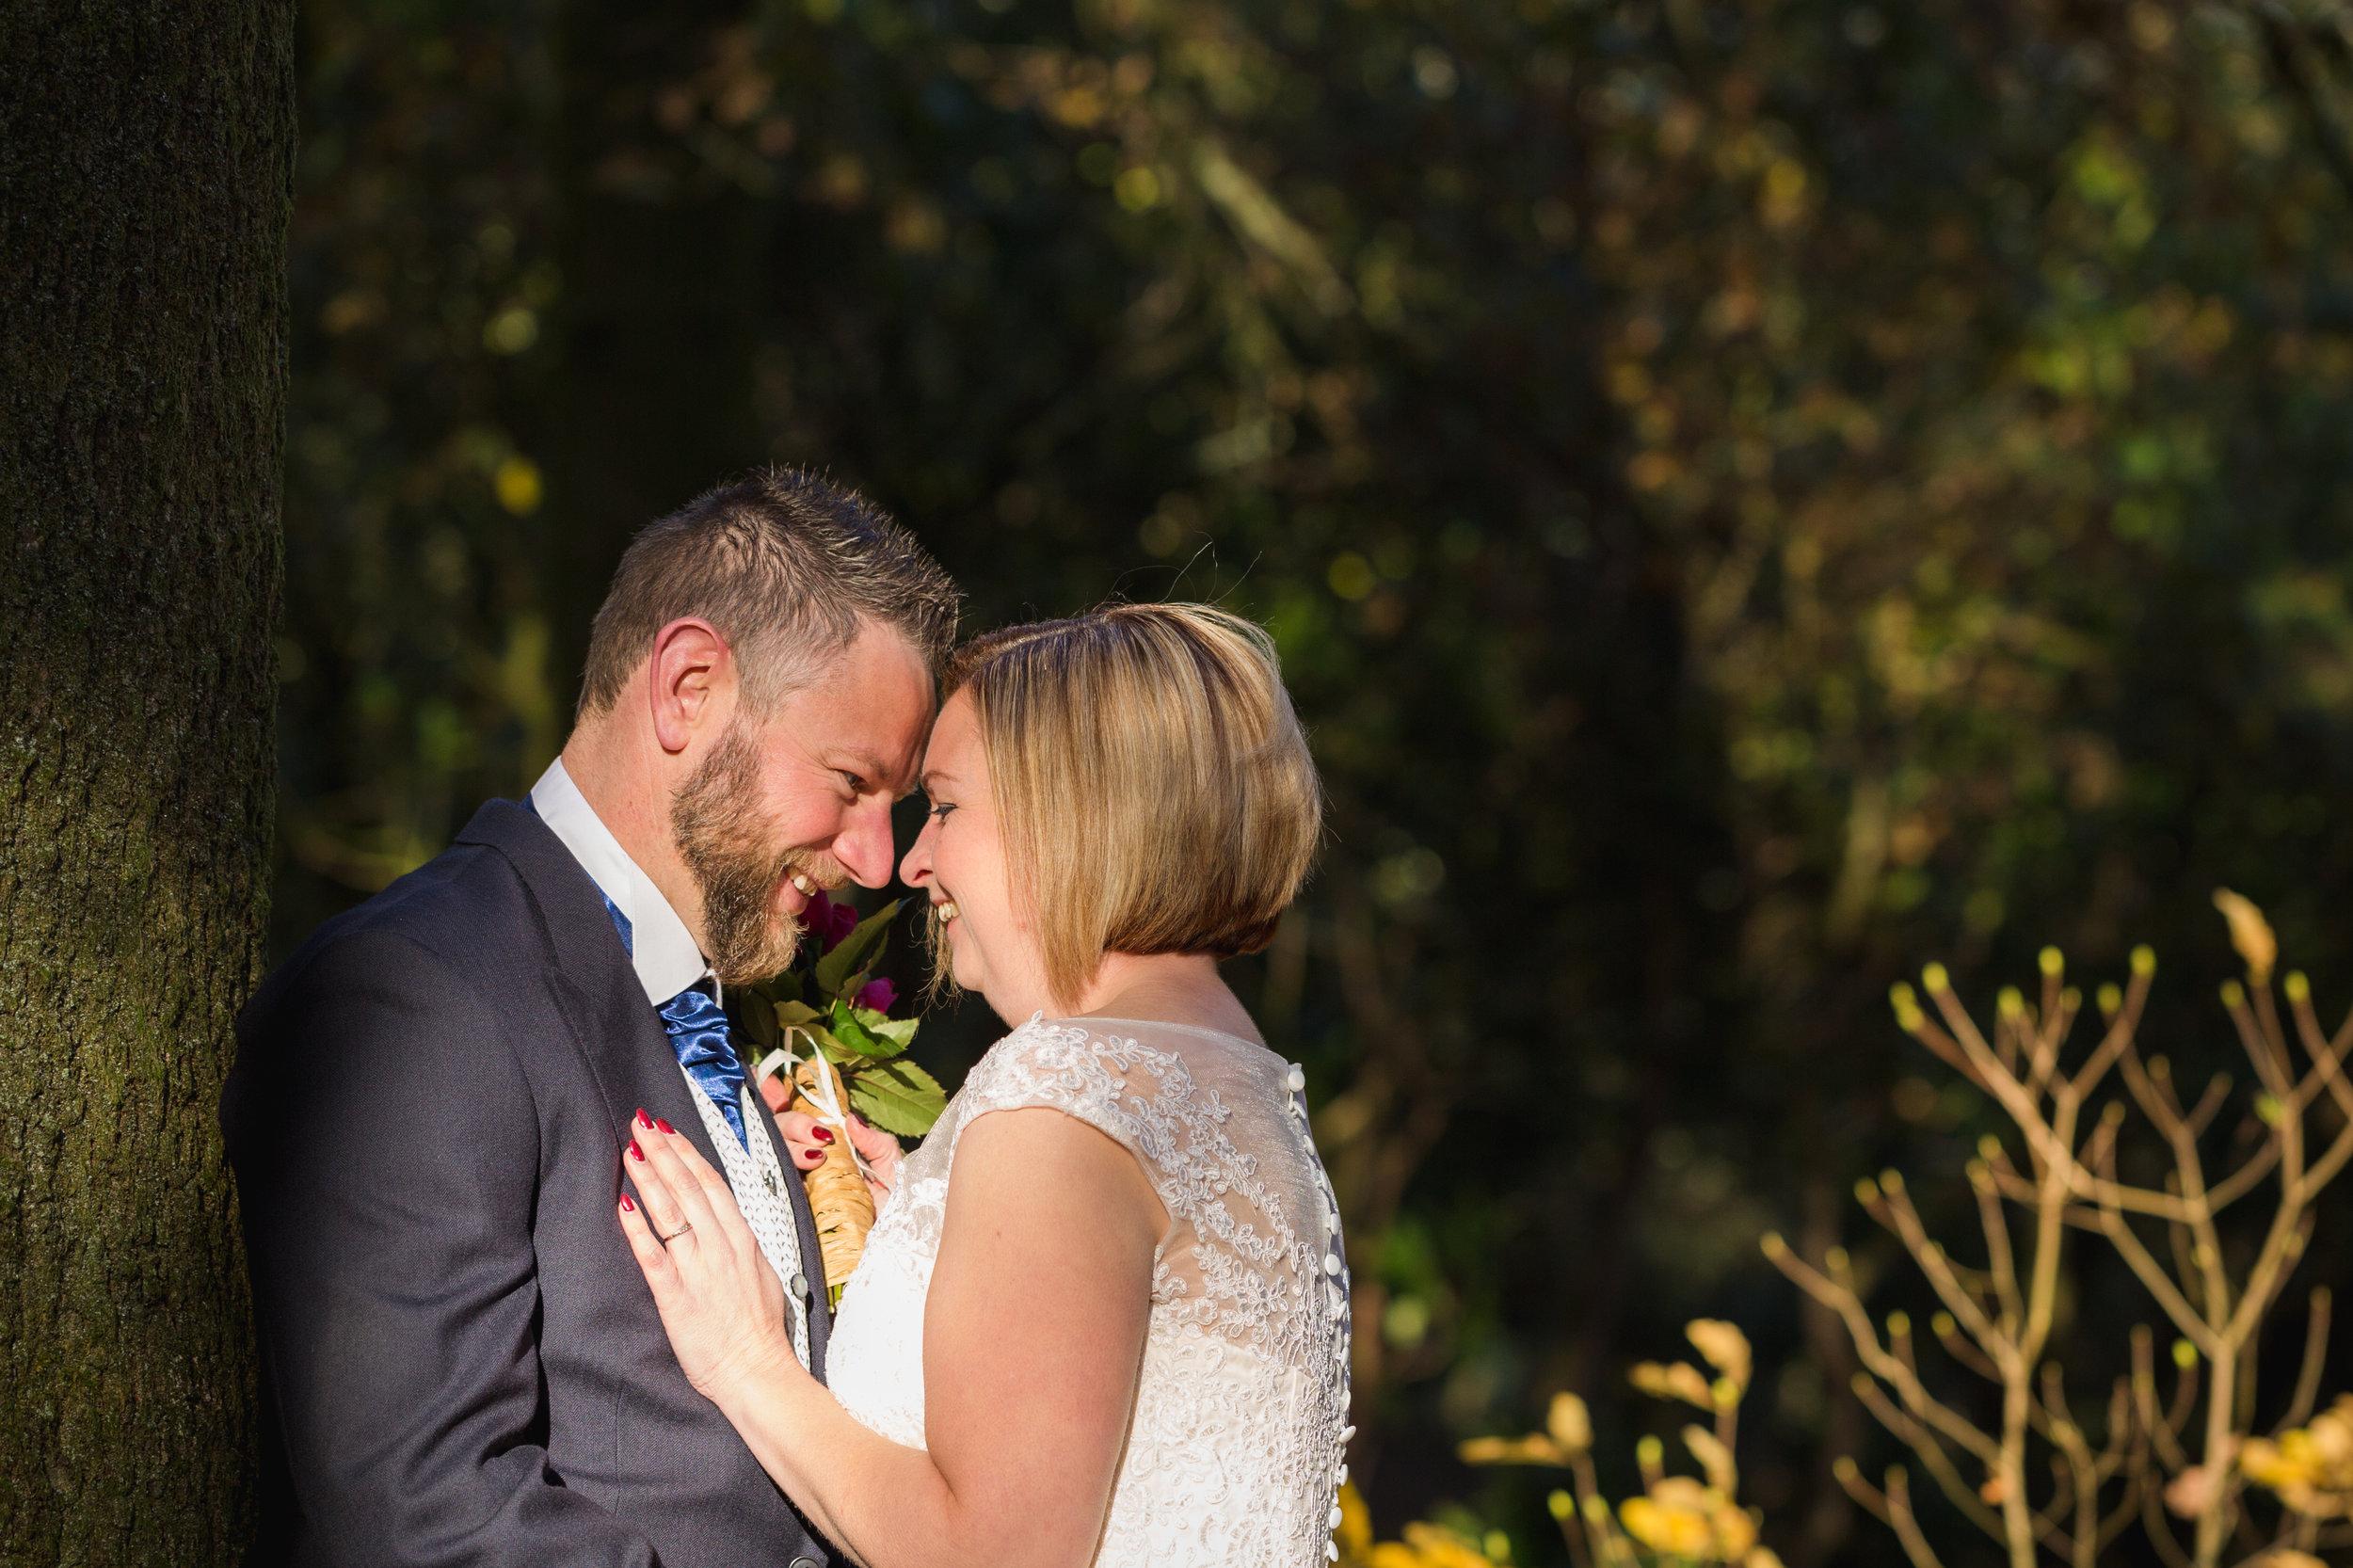 Portrait wedding photo shoot at Cefn On Park, Cardiff